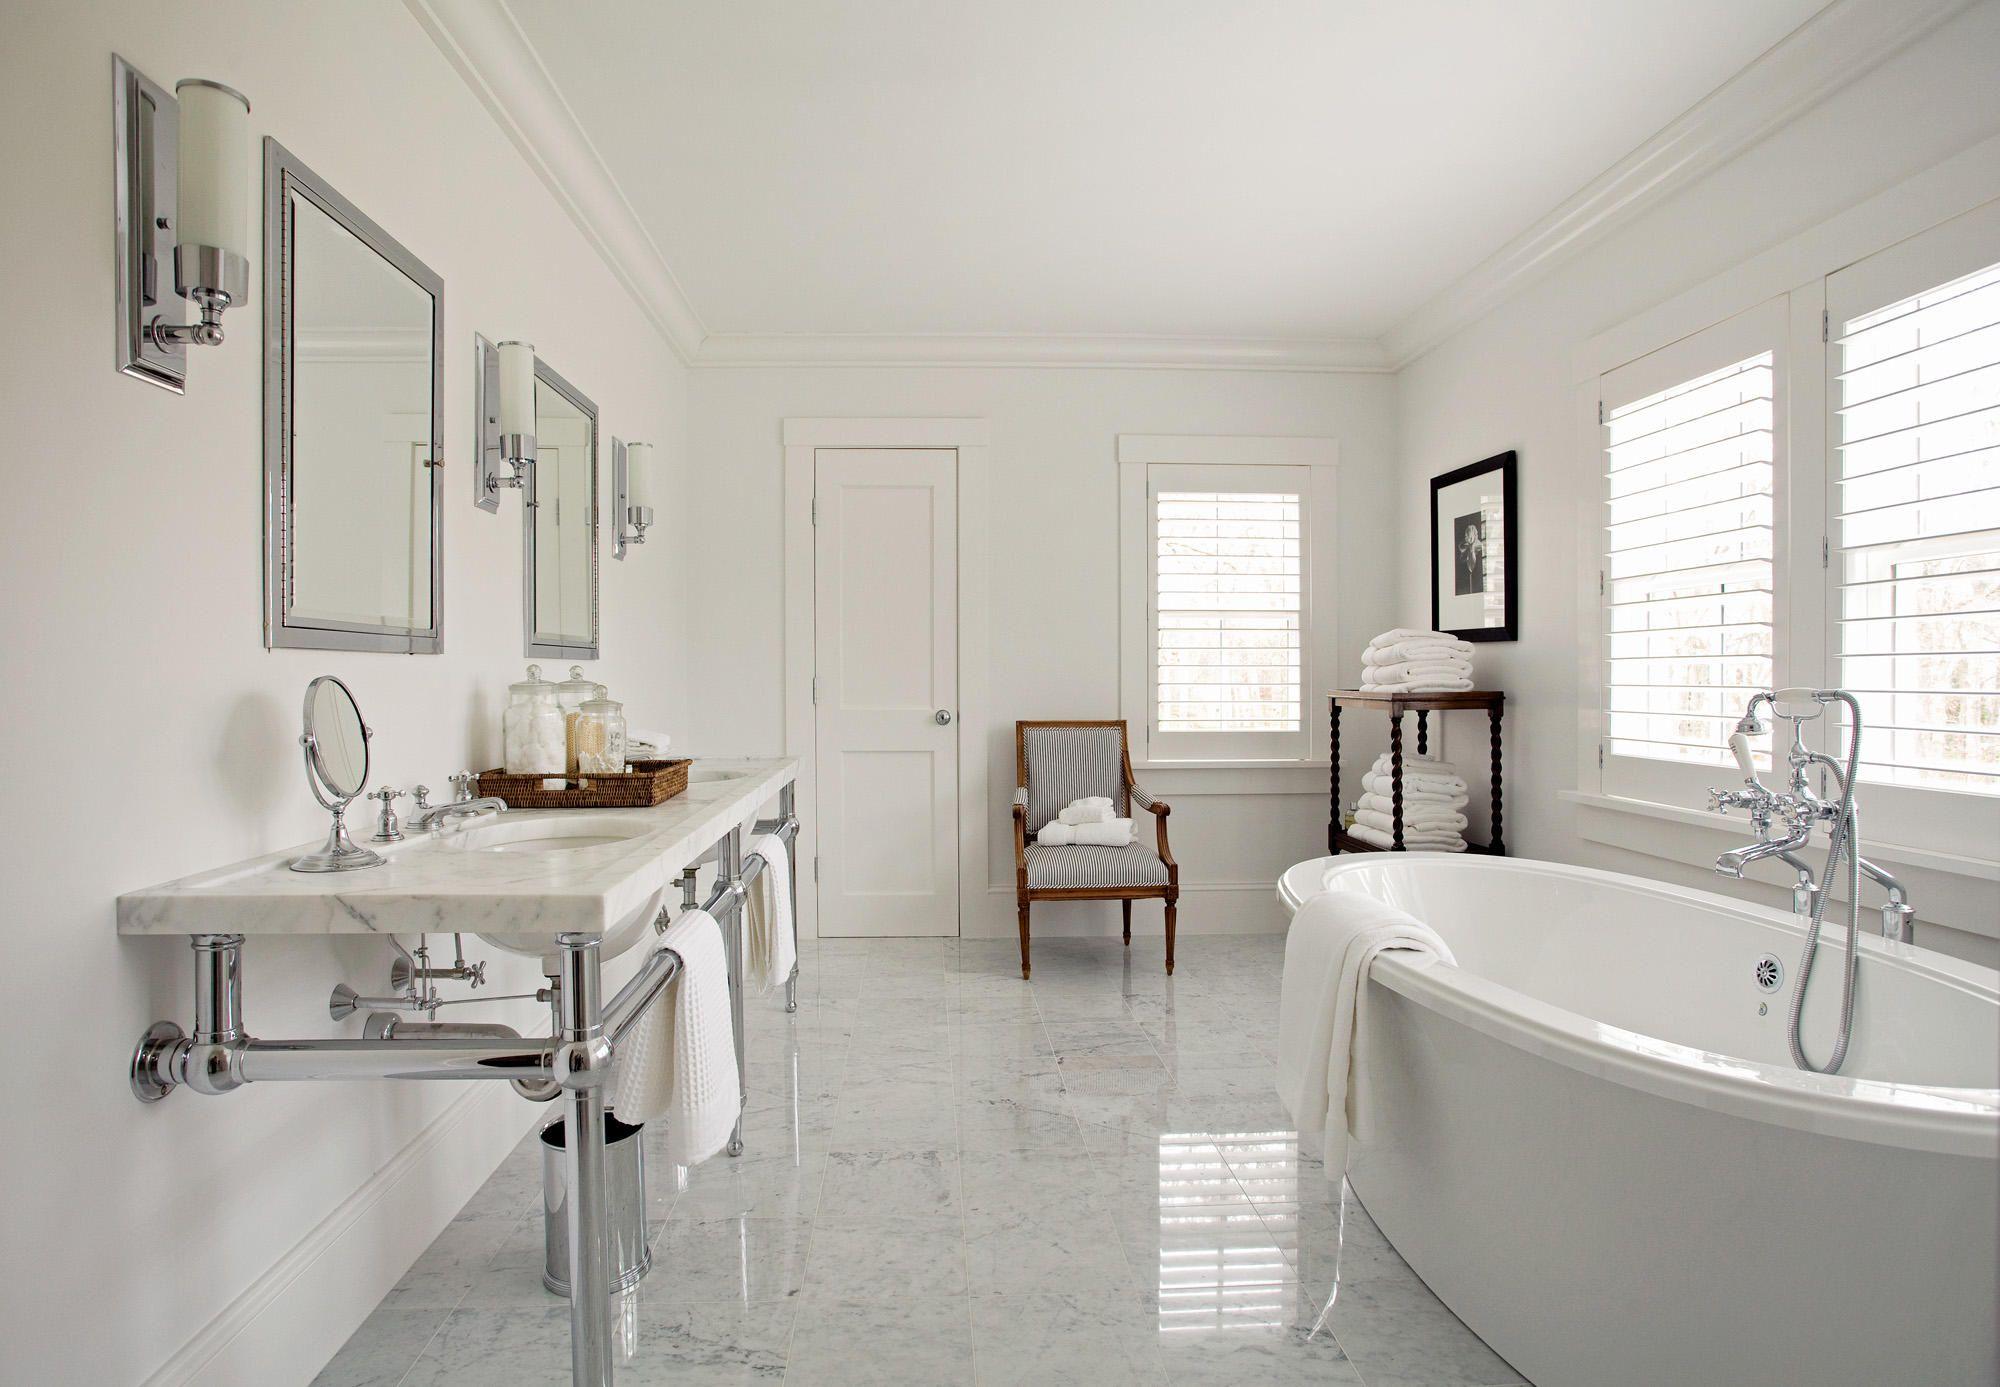 Period-Inspired Plumbing | Bath design, Faucet and Bathroom designs